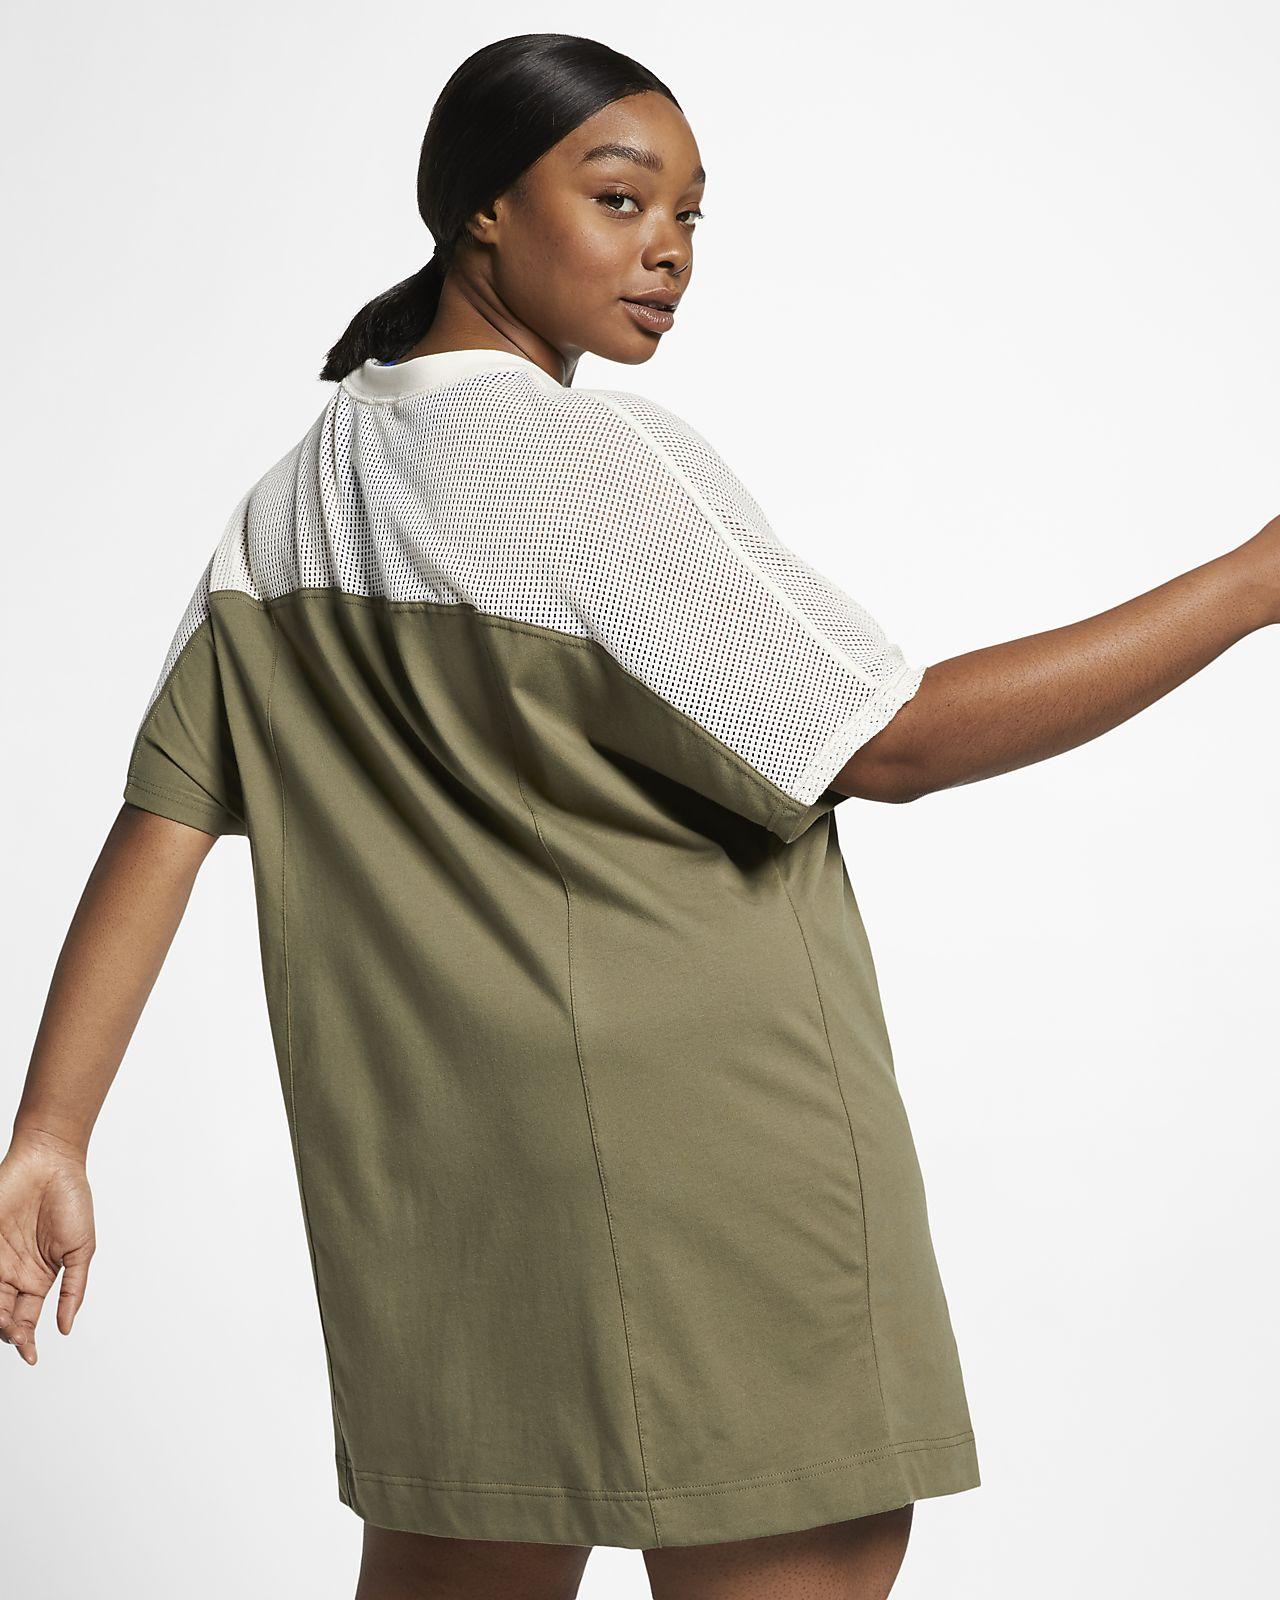 Nike Sportswear Women\'s Mesh Dress (Plus Size). Nike.com